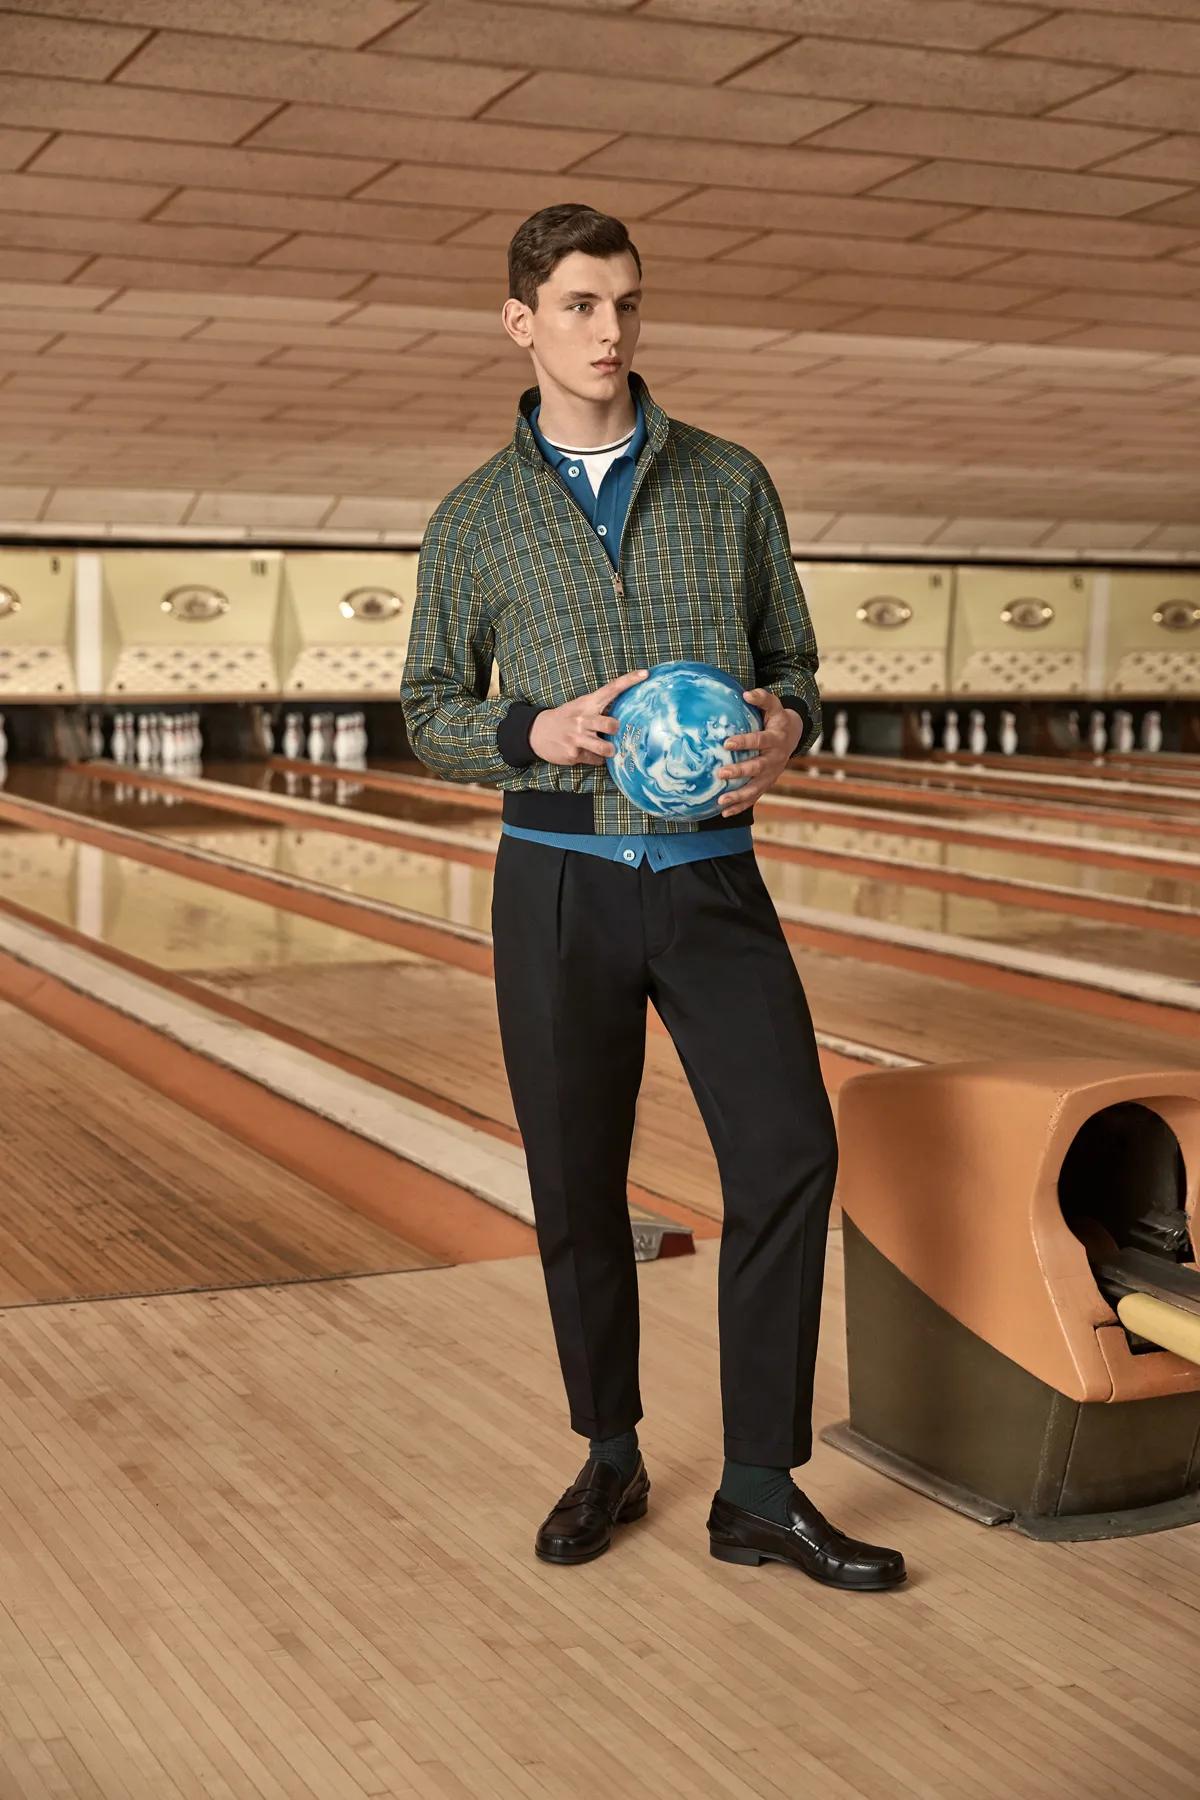 mespromenades-mr-porter-prada-bowling-collection-©-Christopher-Ferguson-02